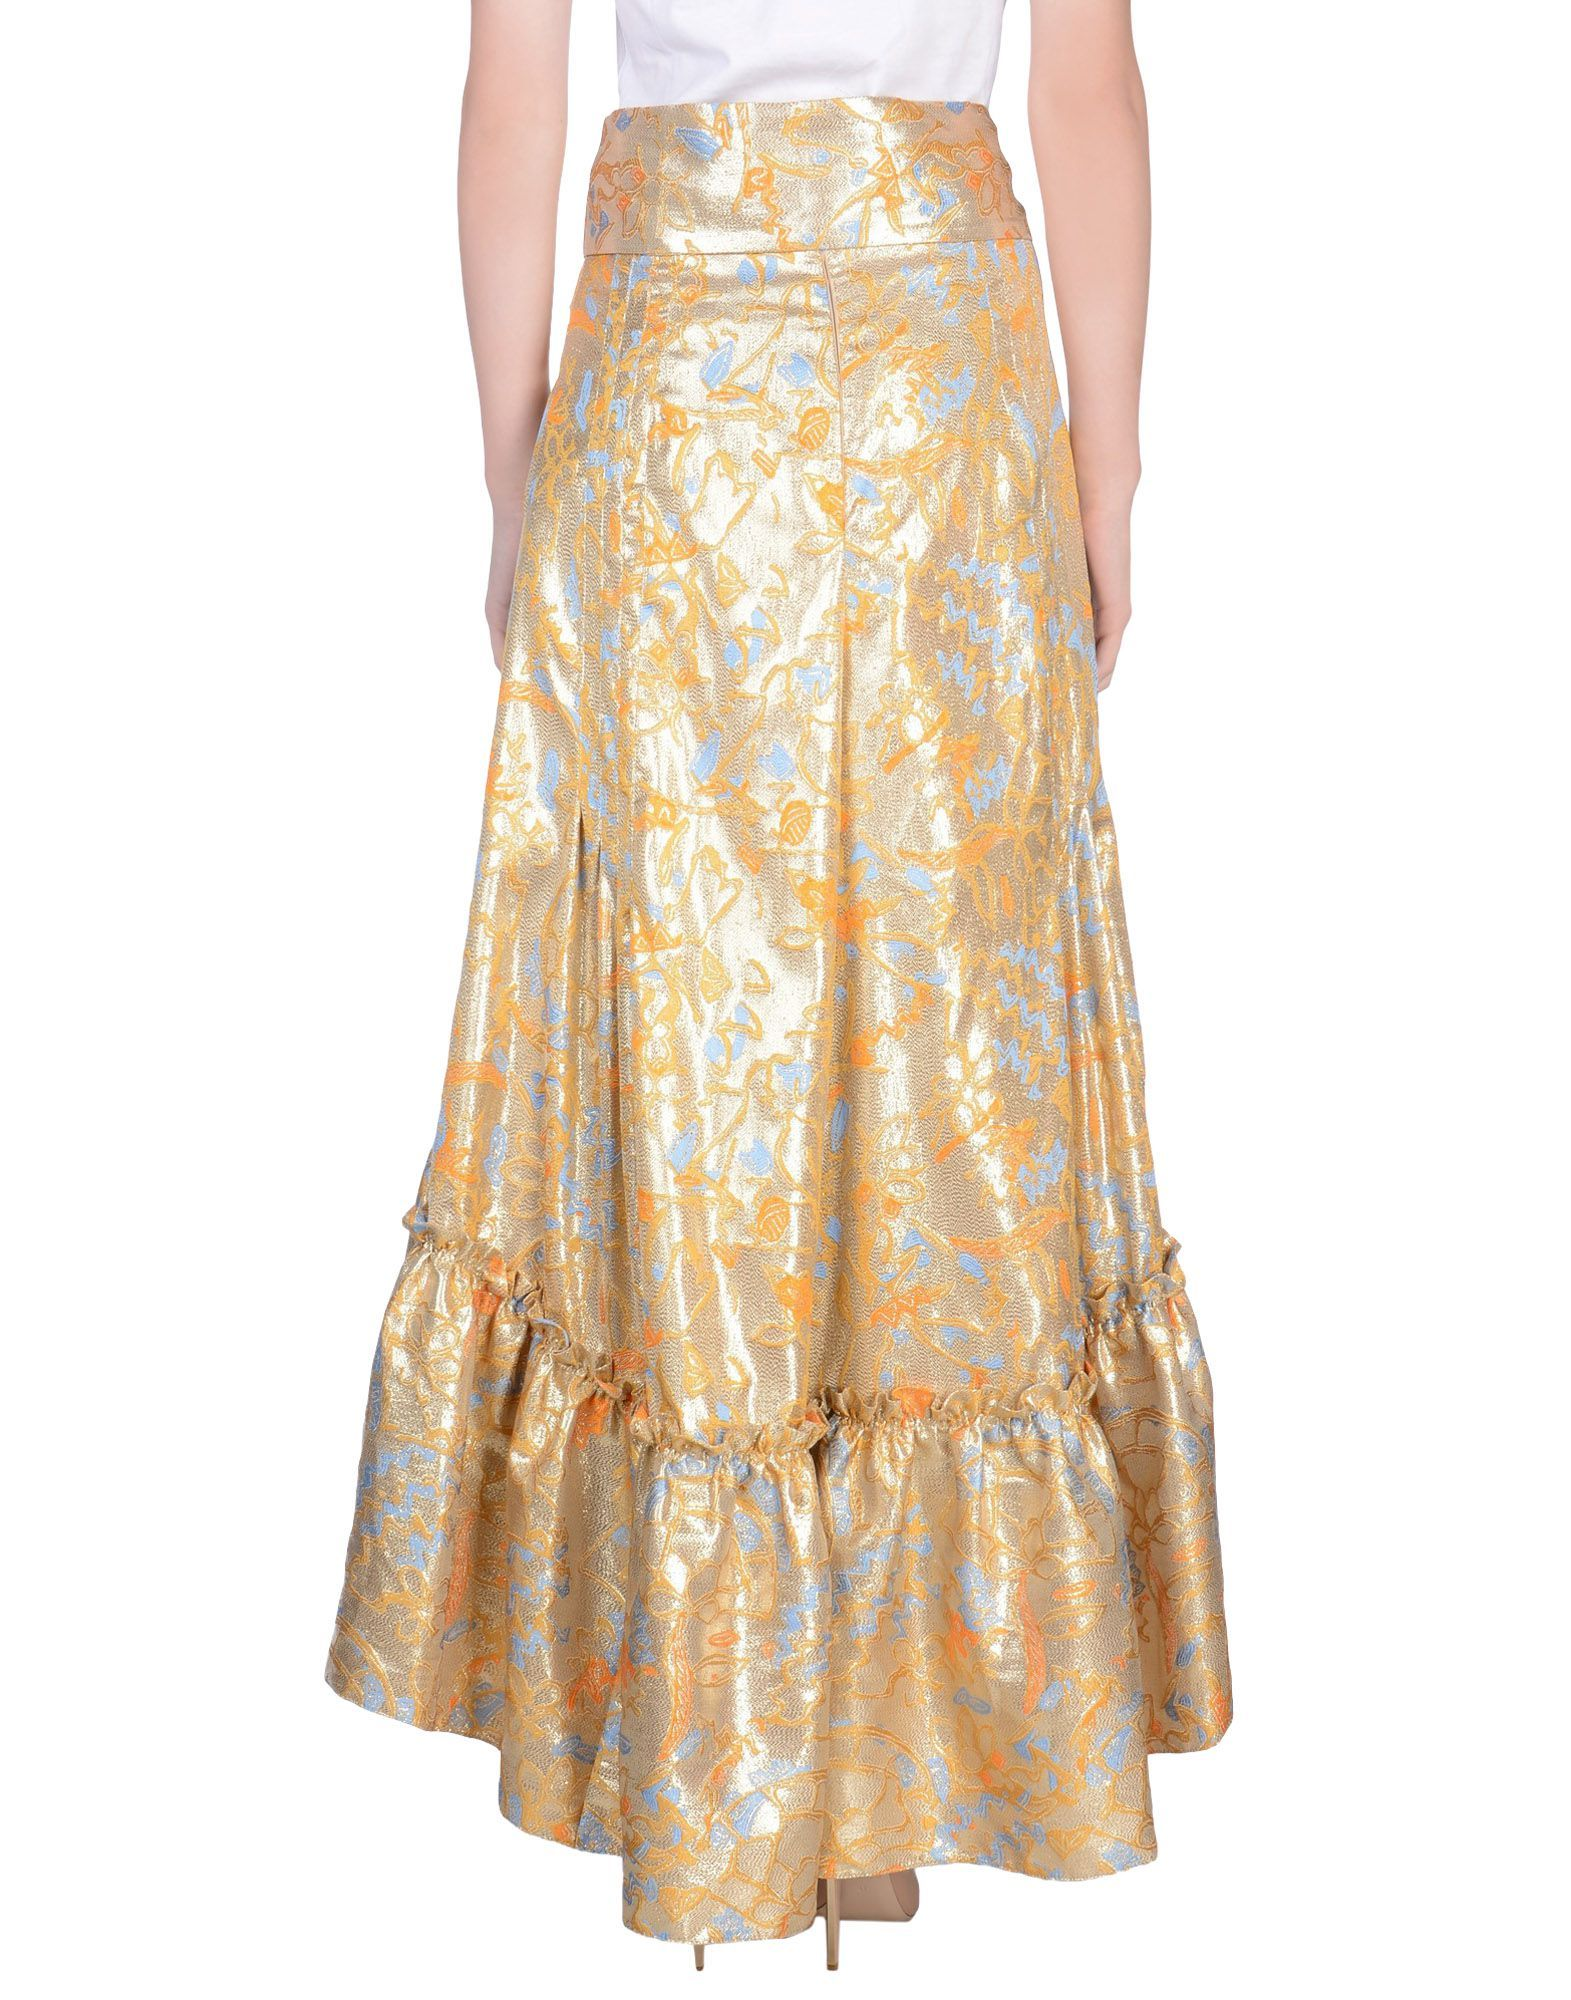 Peter Pilotto Gold 3/4 Length Skirt